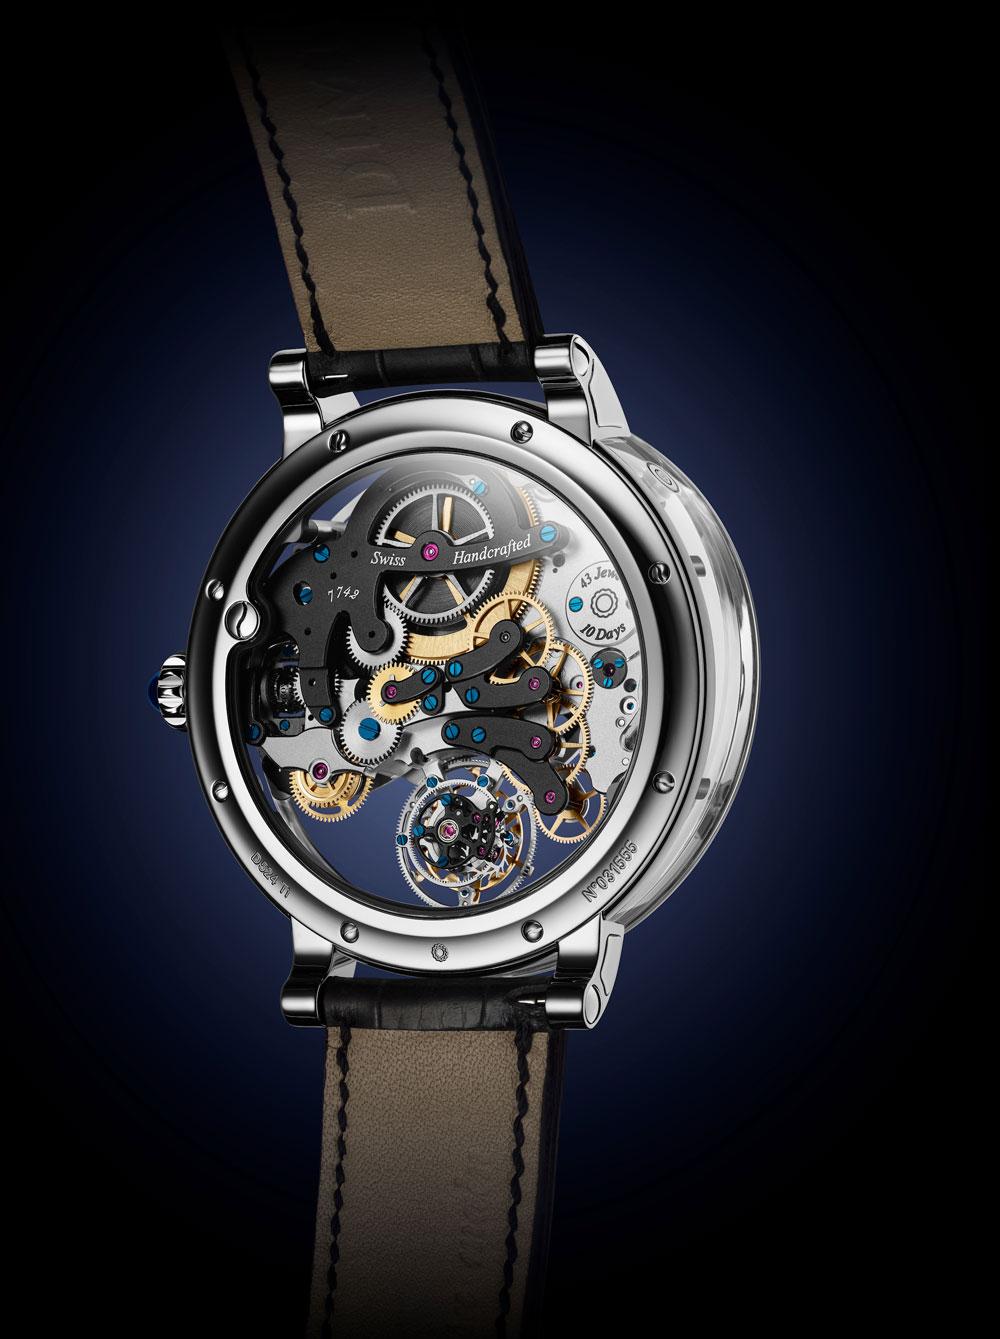 calibre es el 17DM04-SMP patentado por Bovet equipa el reloj Récita 26 Brainstorm Chapter One